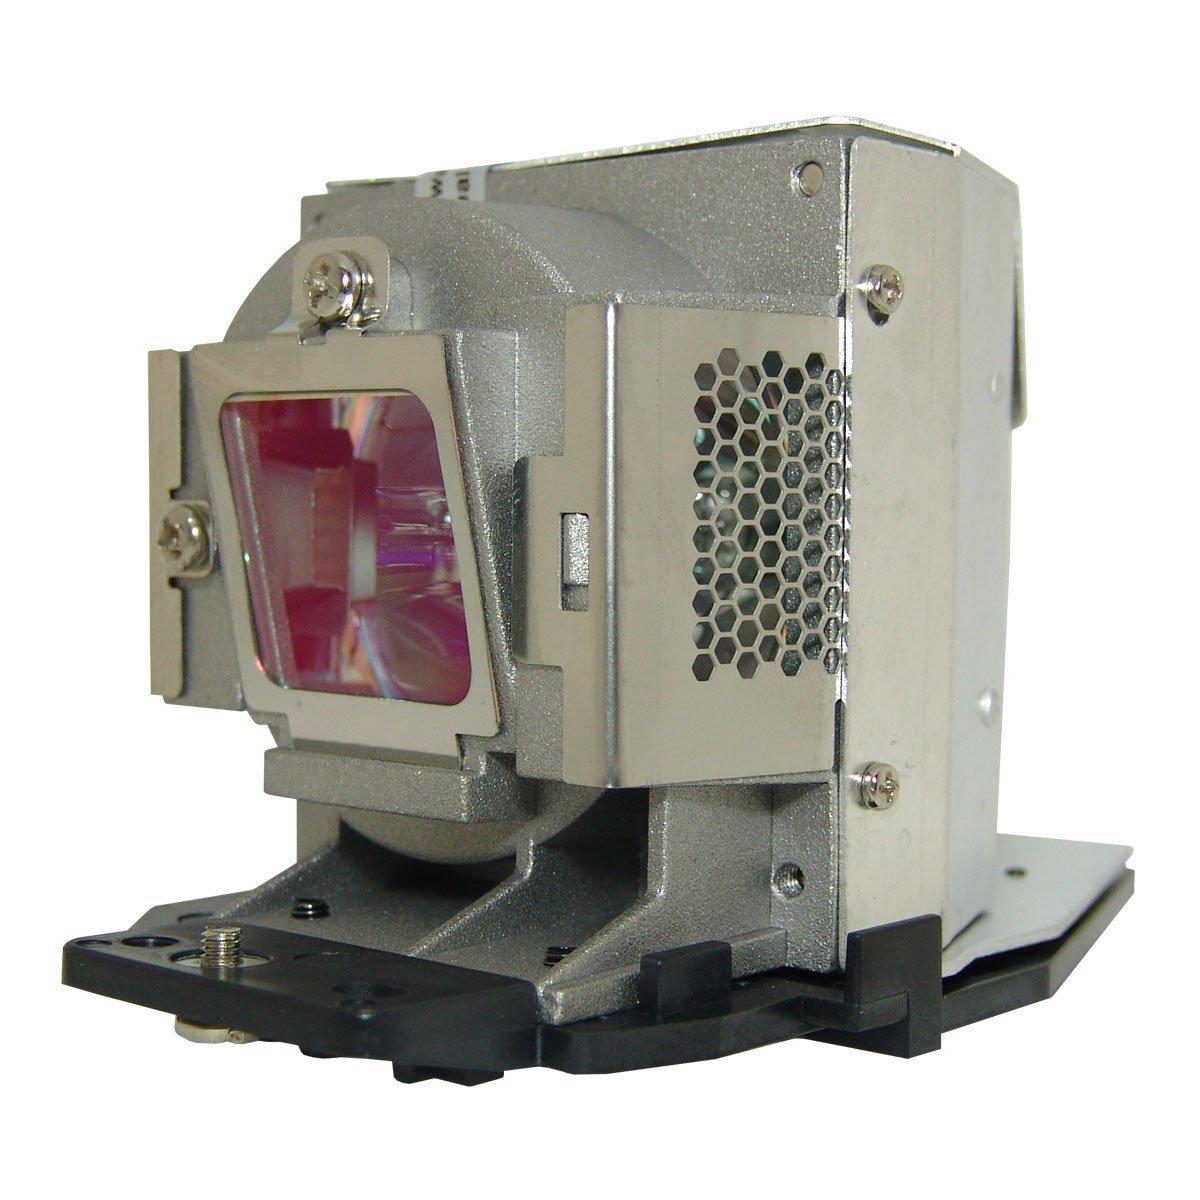 GOLDENRIVER EC.JC900.001 プロジェクターランプアセンブリ 純正OEM裸電球内蔵 ACER S5201 S5201B S5301WB T111 PS-X11 PS-T111E PS-X11K PS-T121E PS-W11K   B07D7S7NZK